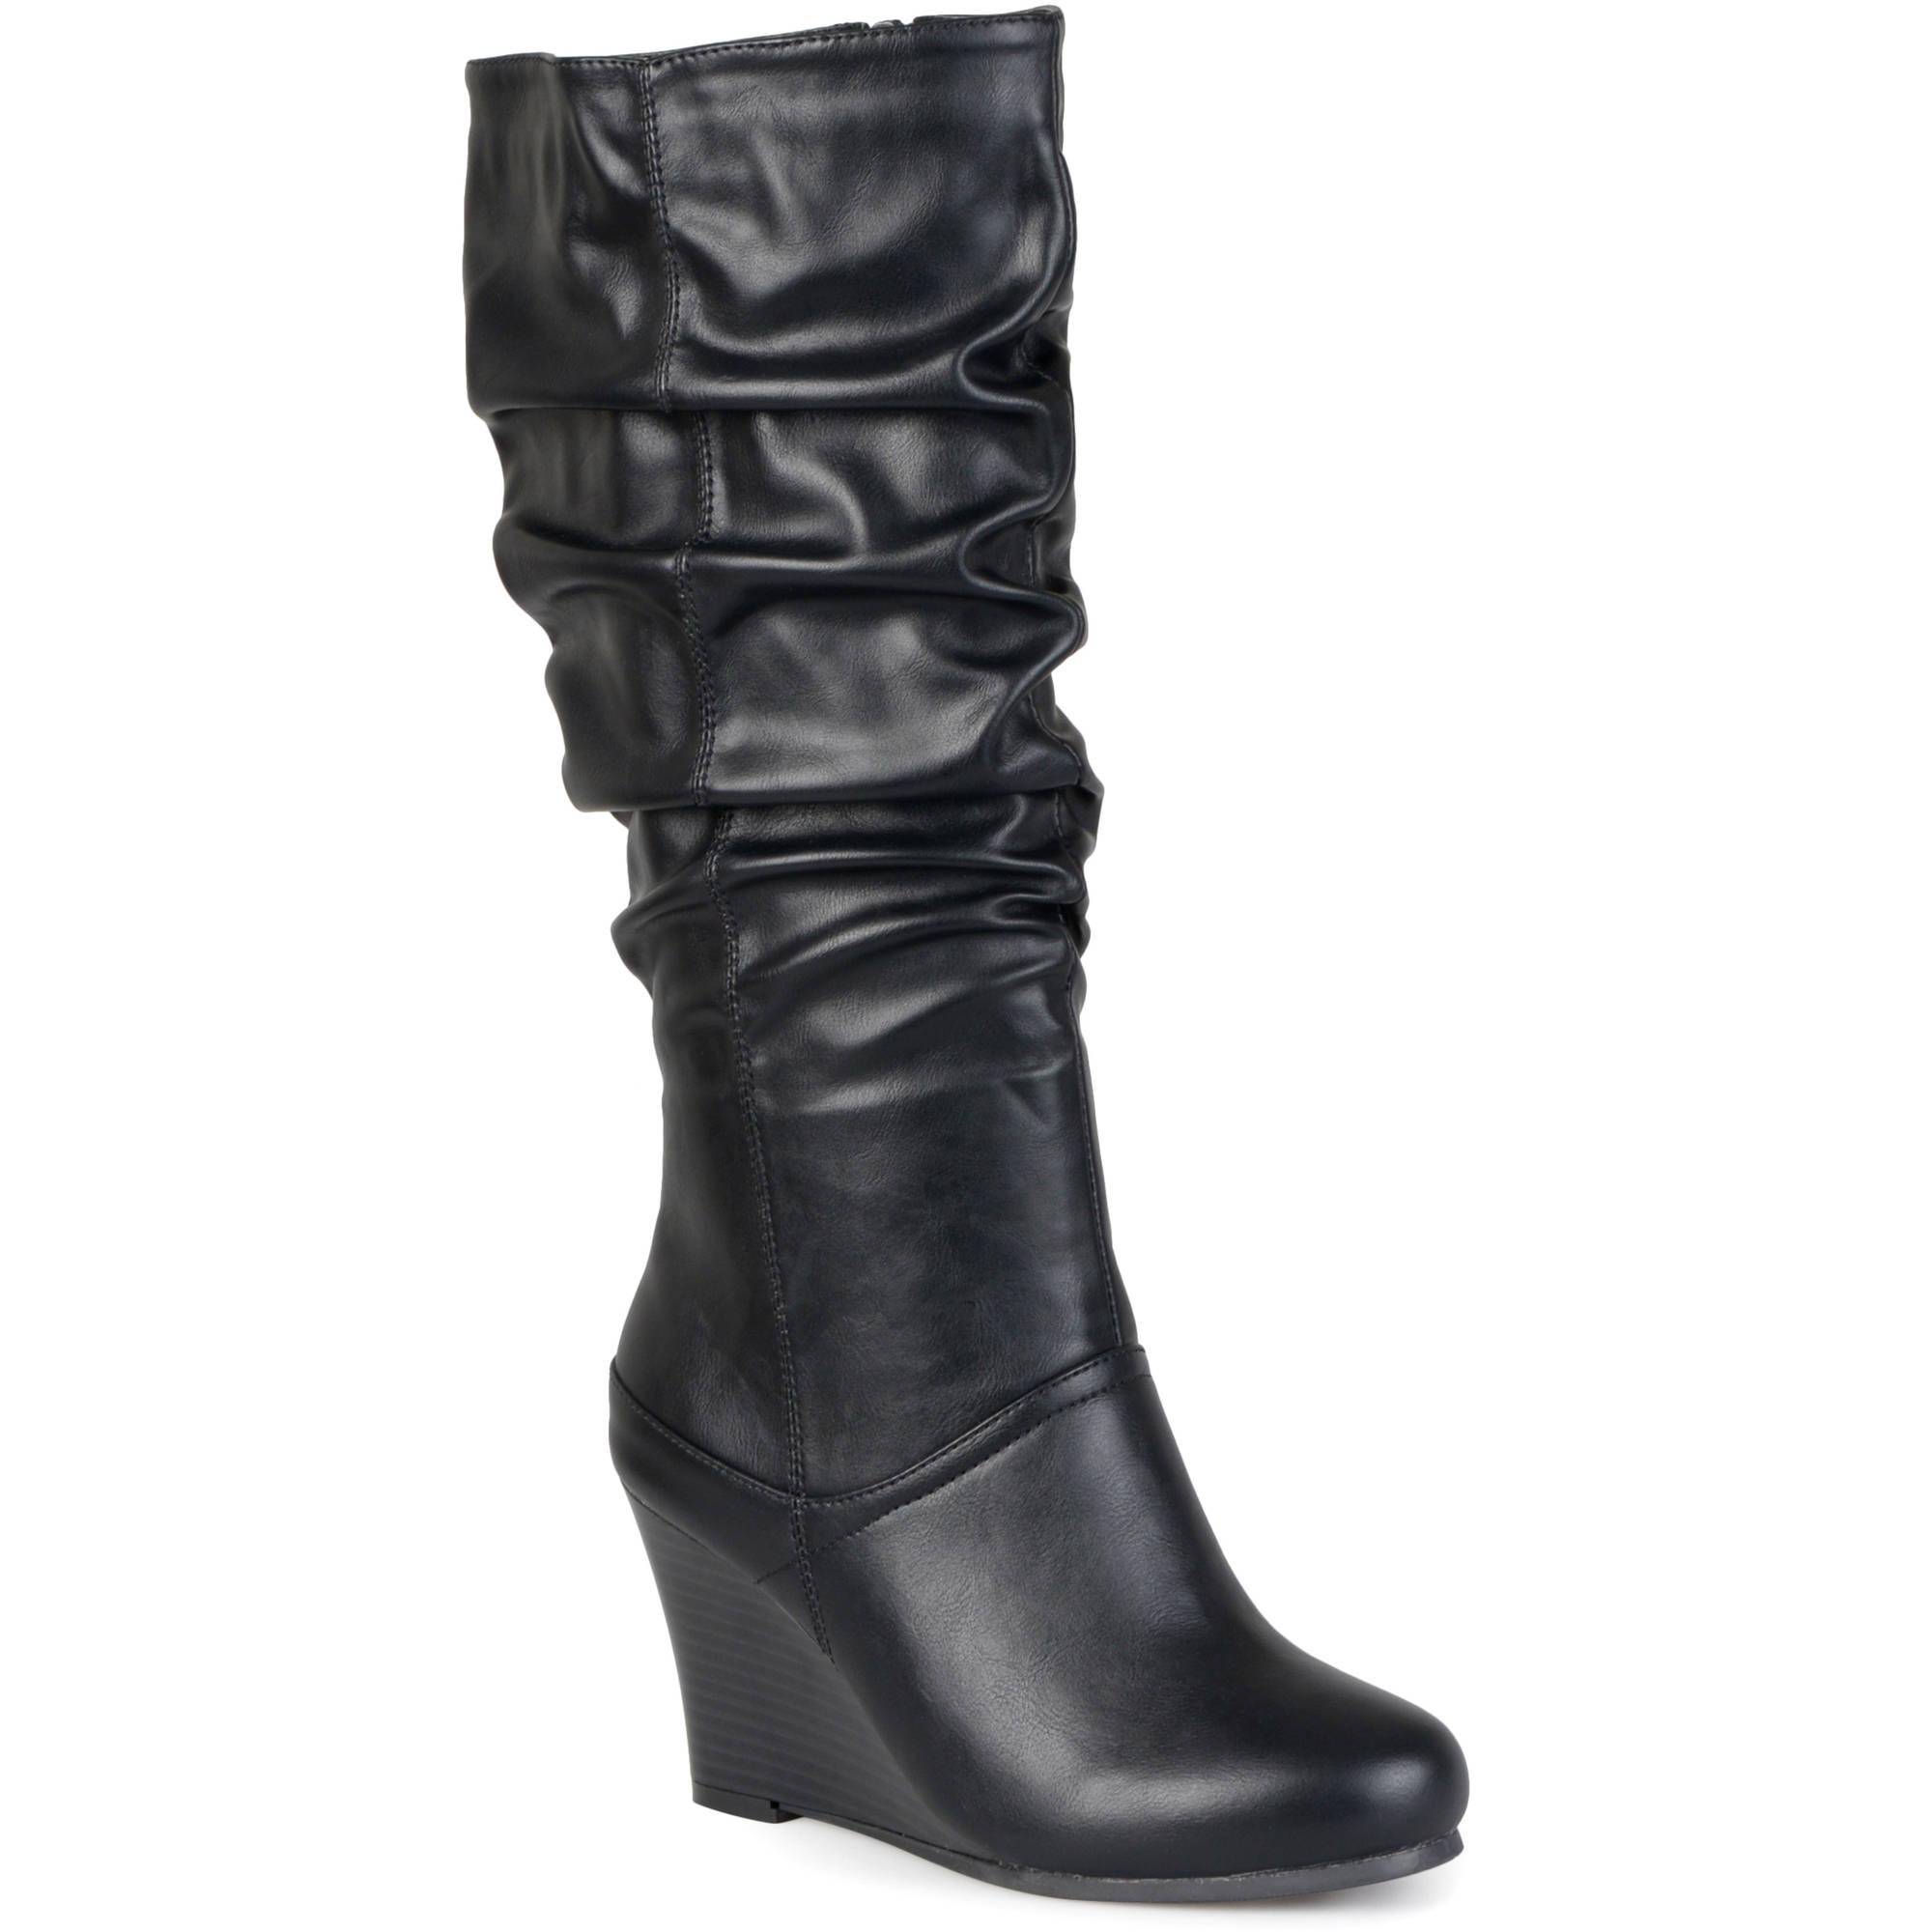 brinley co womens wide calf slouchy wedge boots walmart